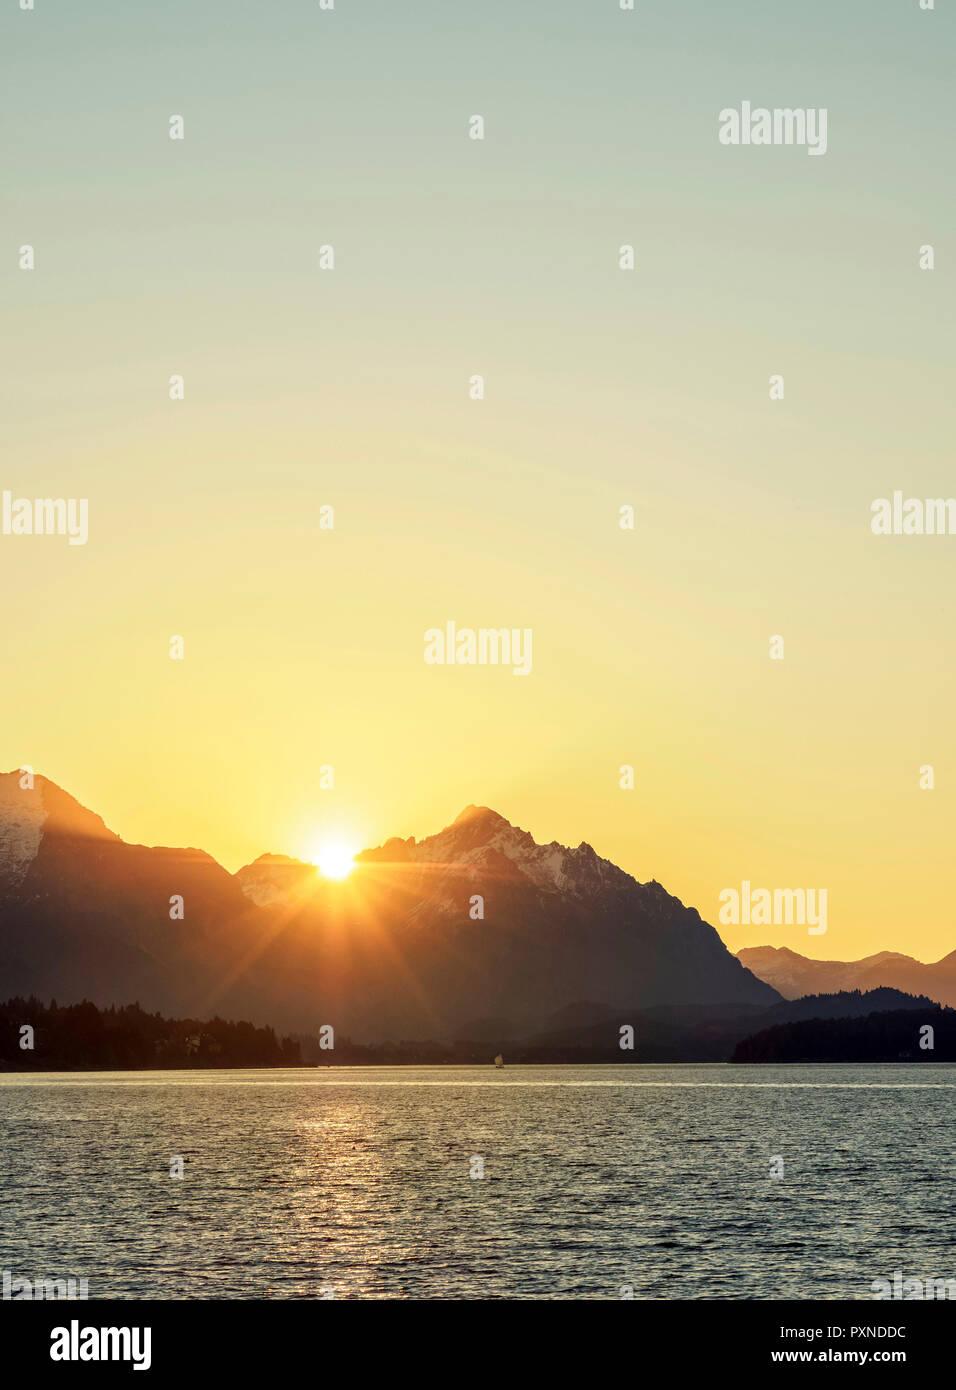 Nahuel Huapi Lake at sunset, San Carlos de Bariloche, Nahuel Huapi National Park, Rio Negro Province, Argentina - Stock Image